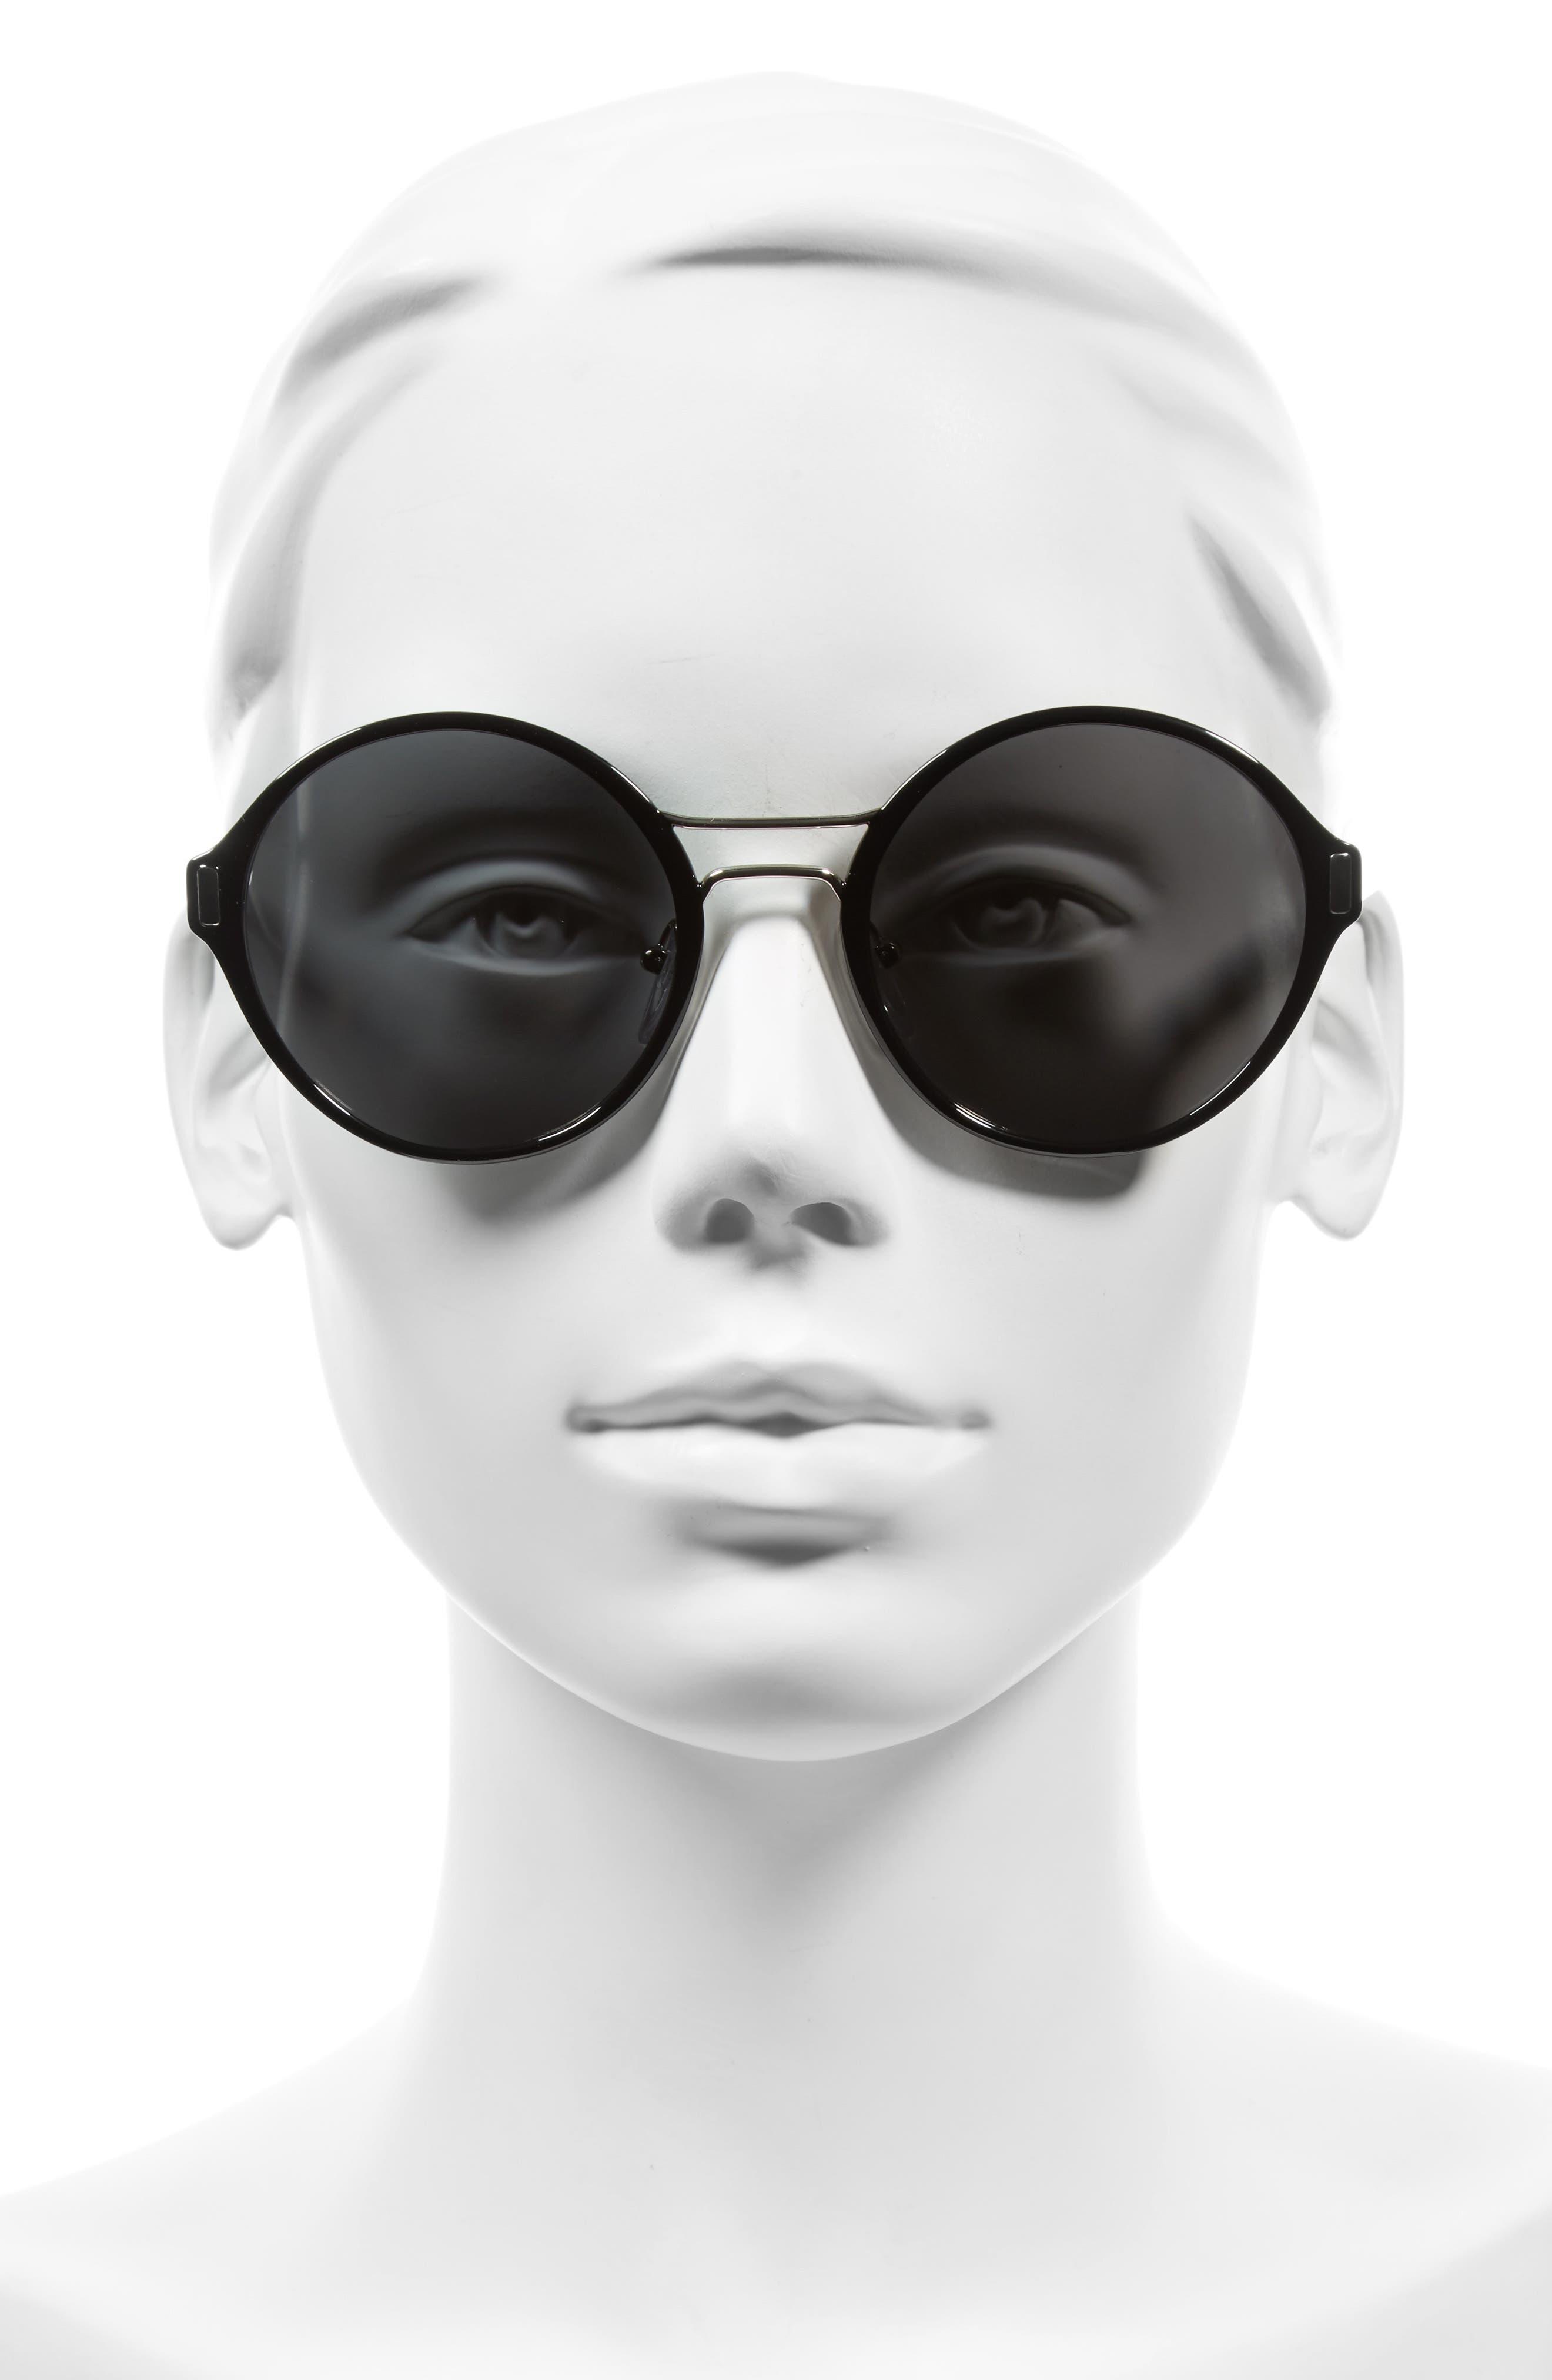 54mm Round Sunglasses,                             Alternate thumbnail 2, color,                             Black